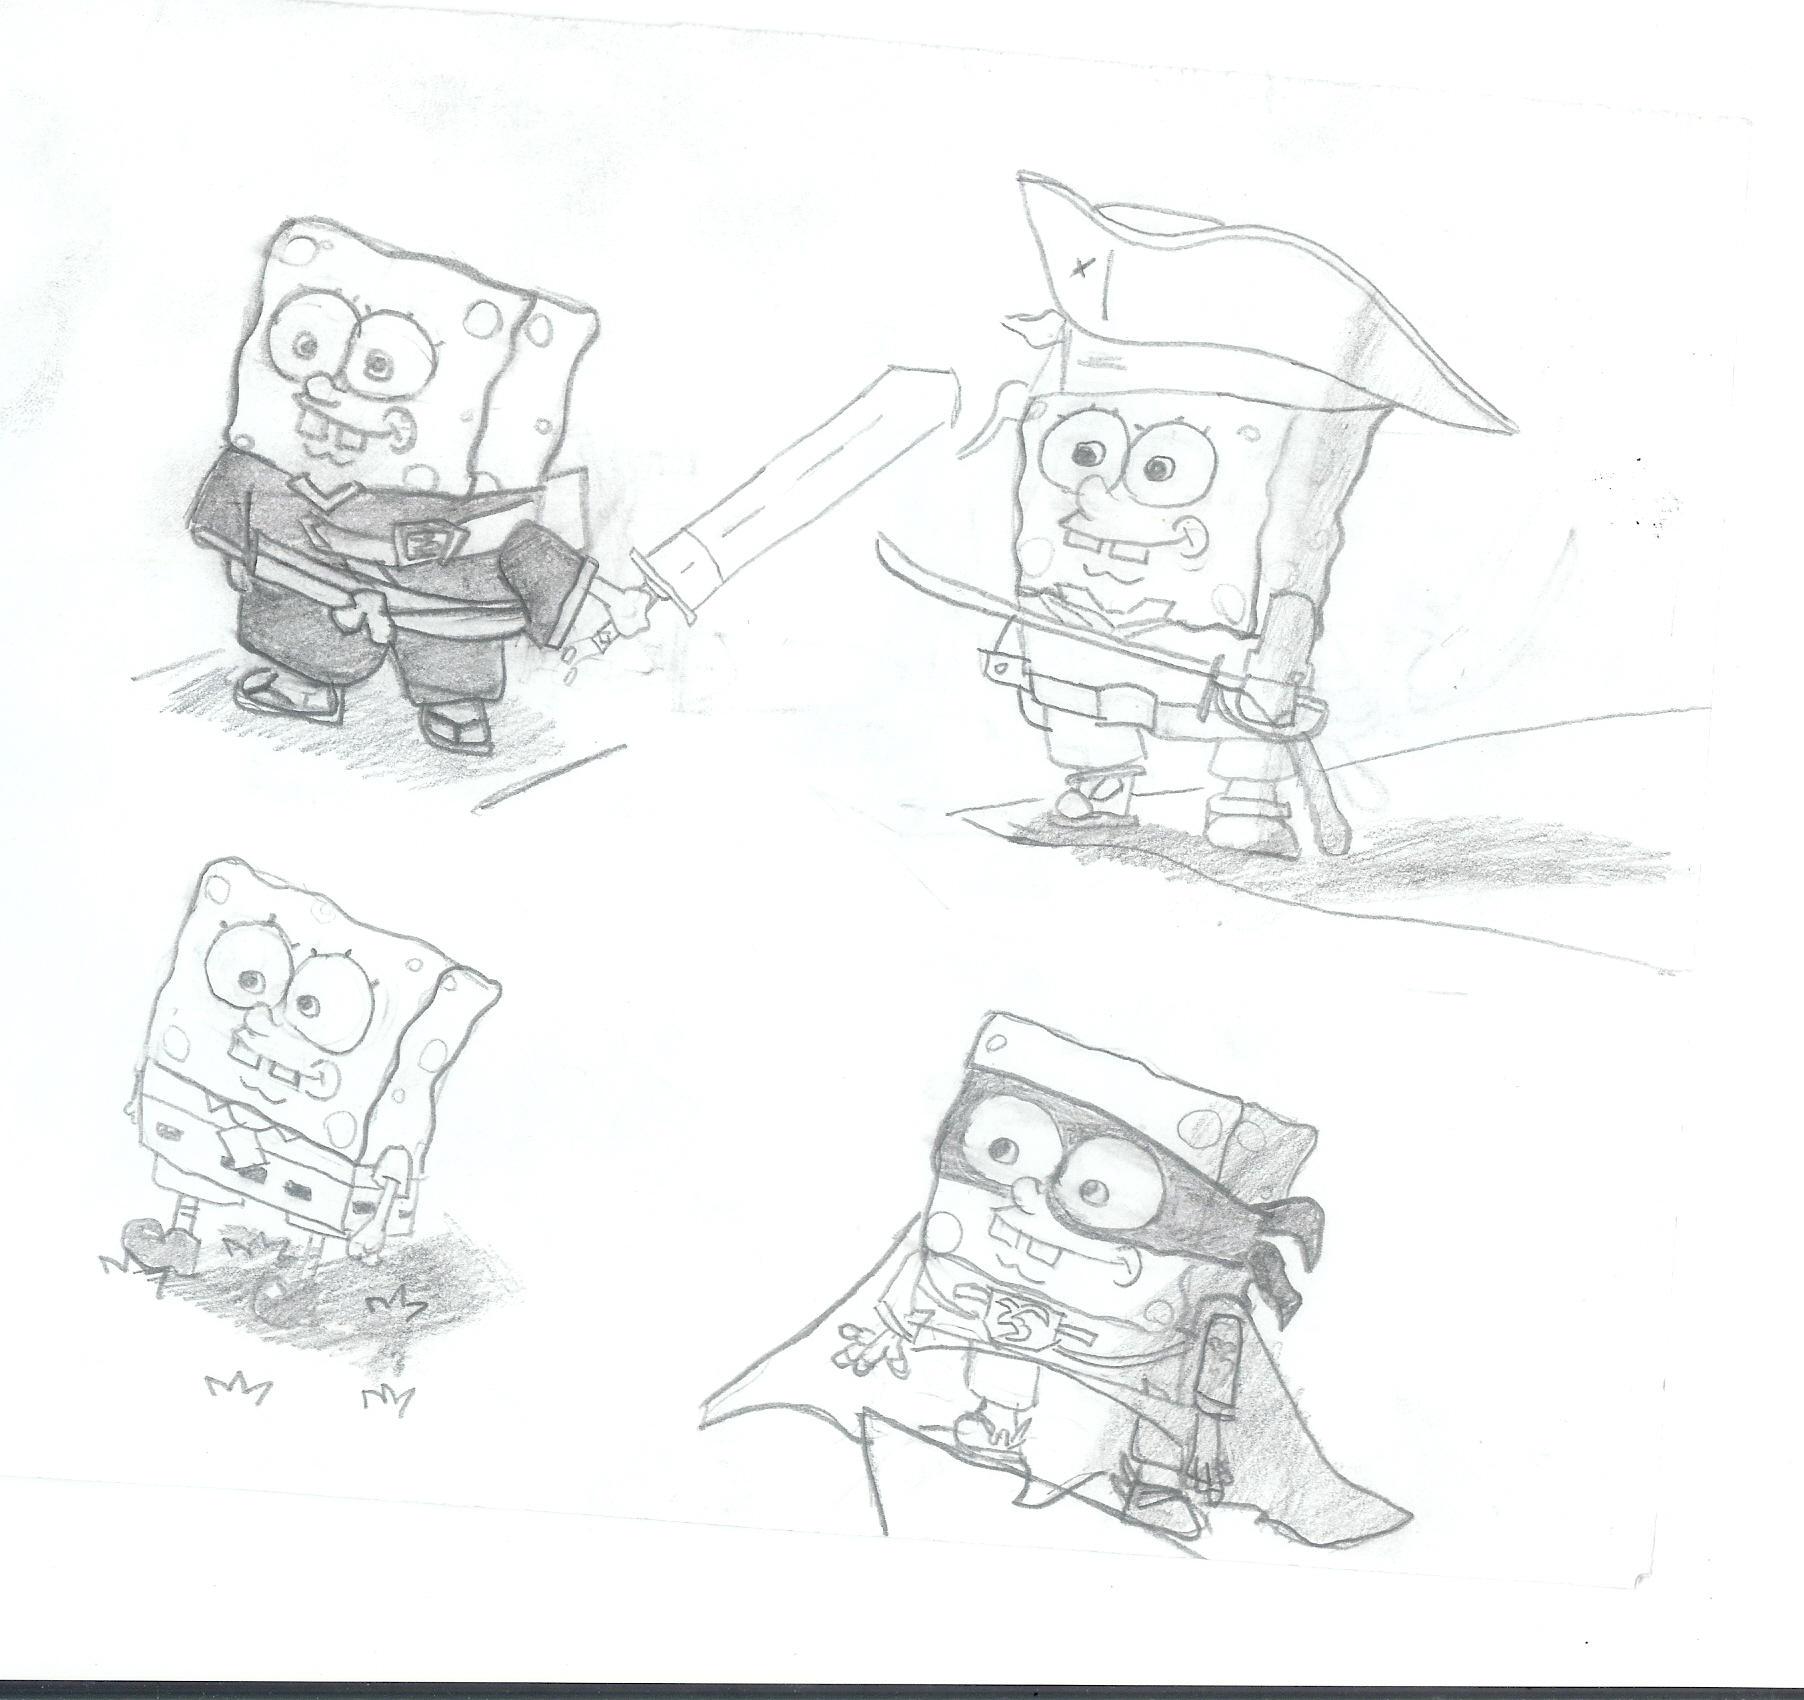 Spongebob experiment by Newbiemember